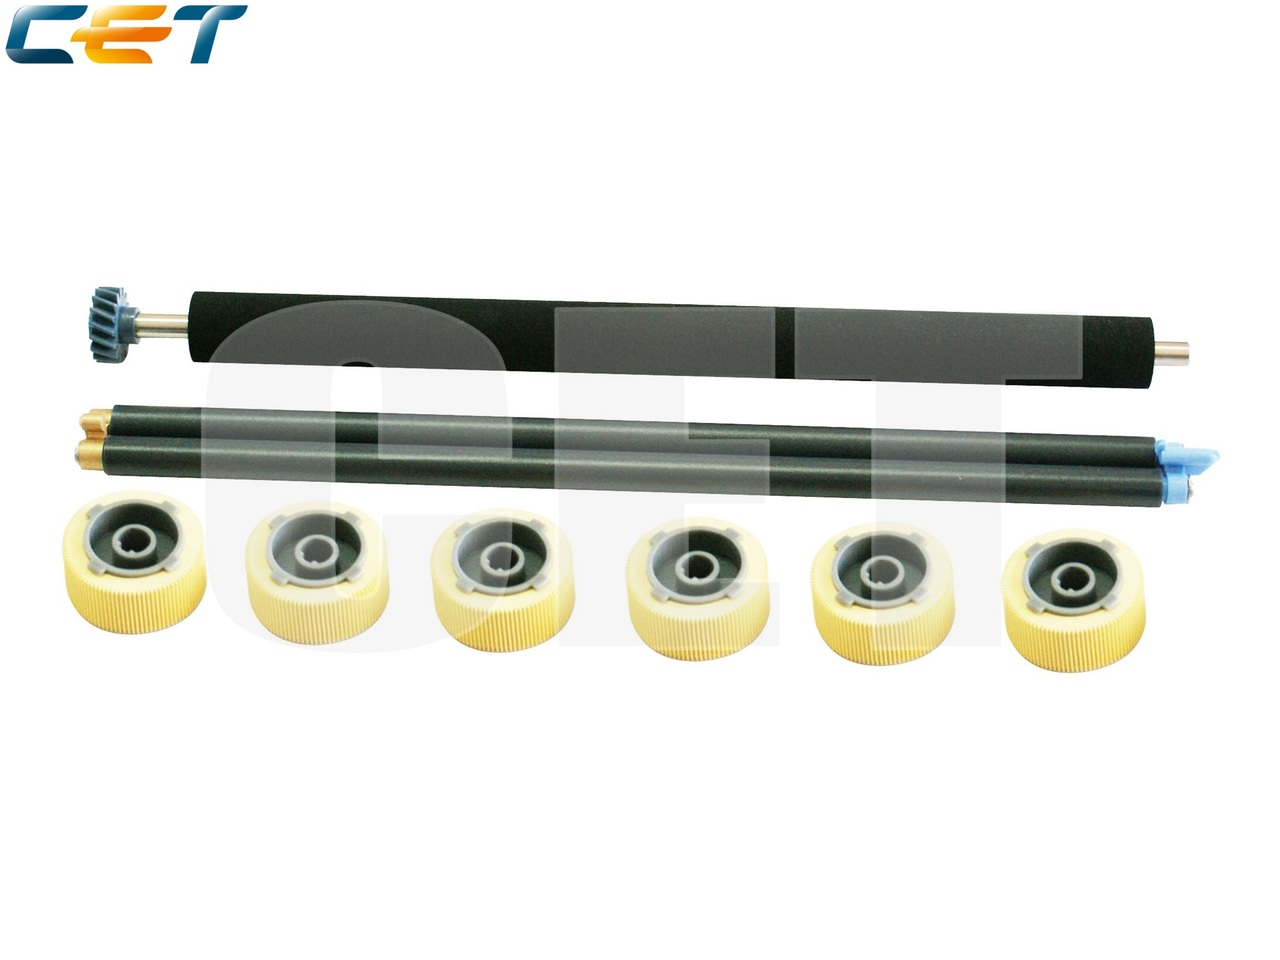 Комплект роликов 40X5852 (1 шт.), 40X1886 (1 шт.), 40X4308 (6шт.) для LEXMARK T650/T652/T654/X651/X652/X654/X656/X658(CET), CET5988